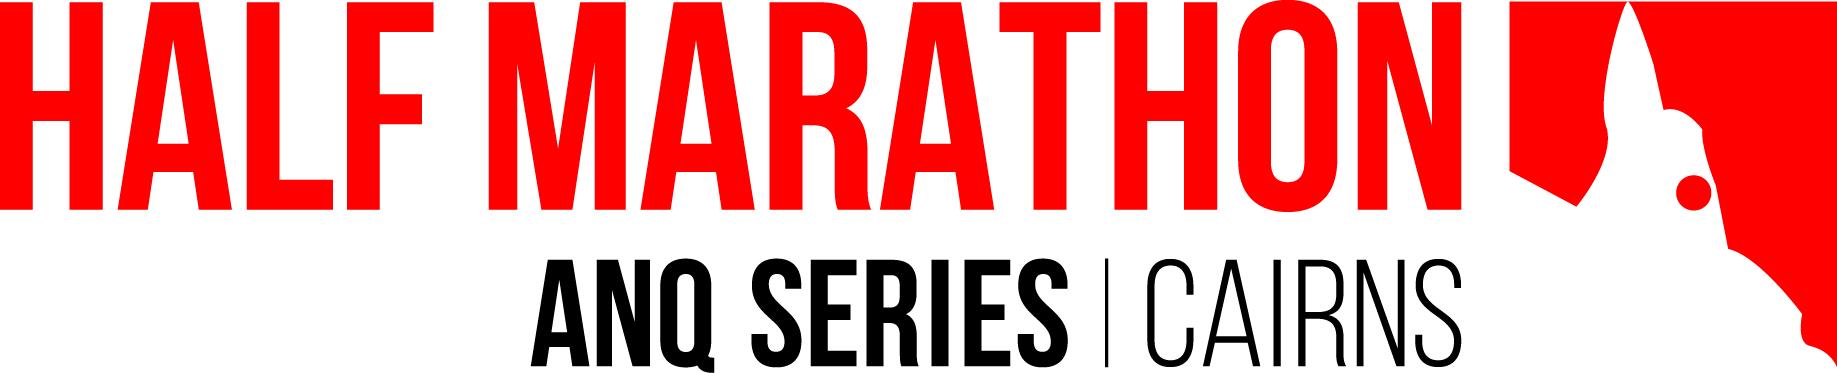 2015 CAIRNS Half Marathon Series logo_highres CMYK